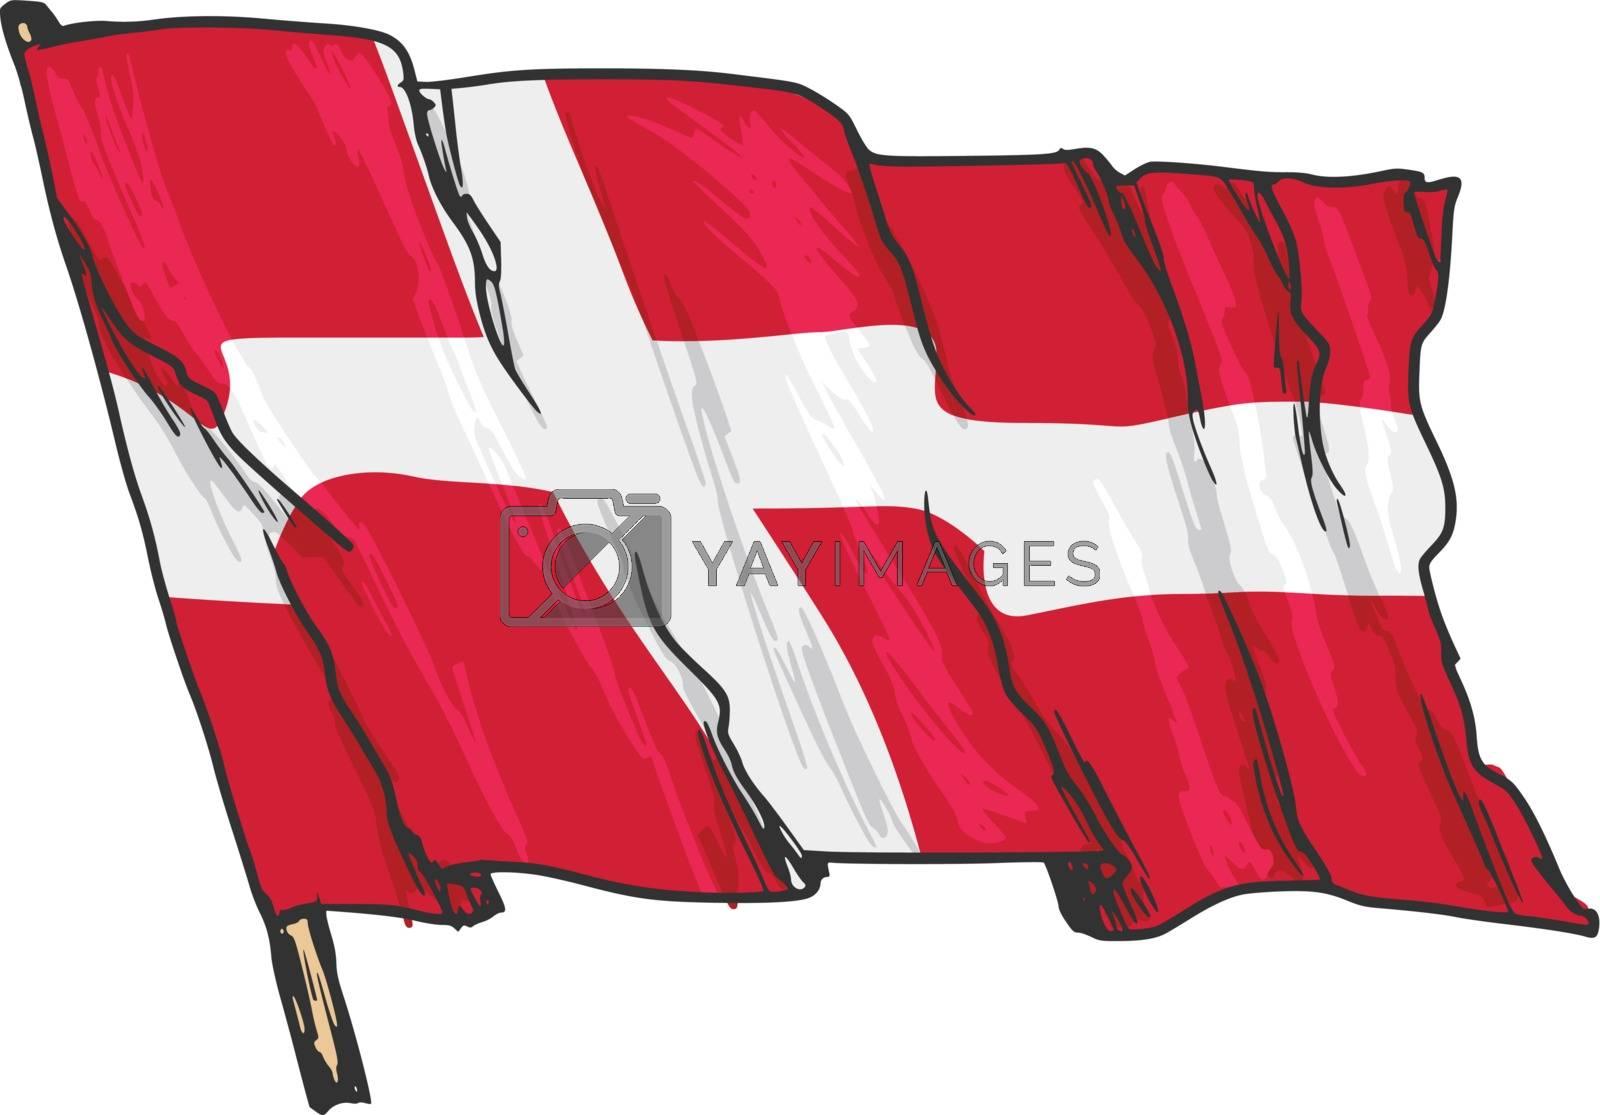 hand drawn, sketch, illustration of flag of Denmark